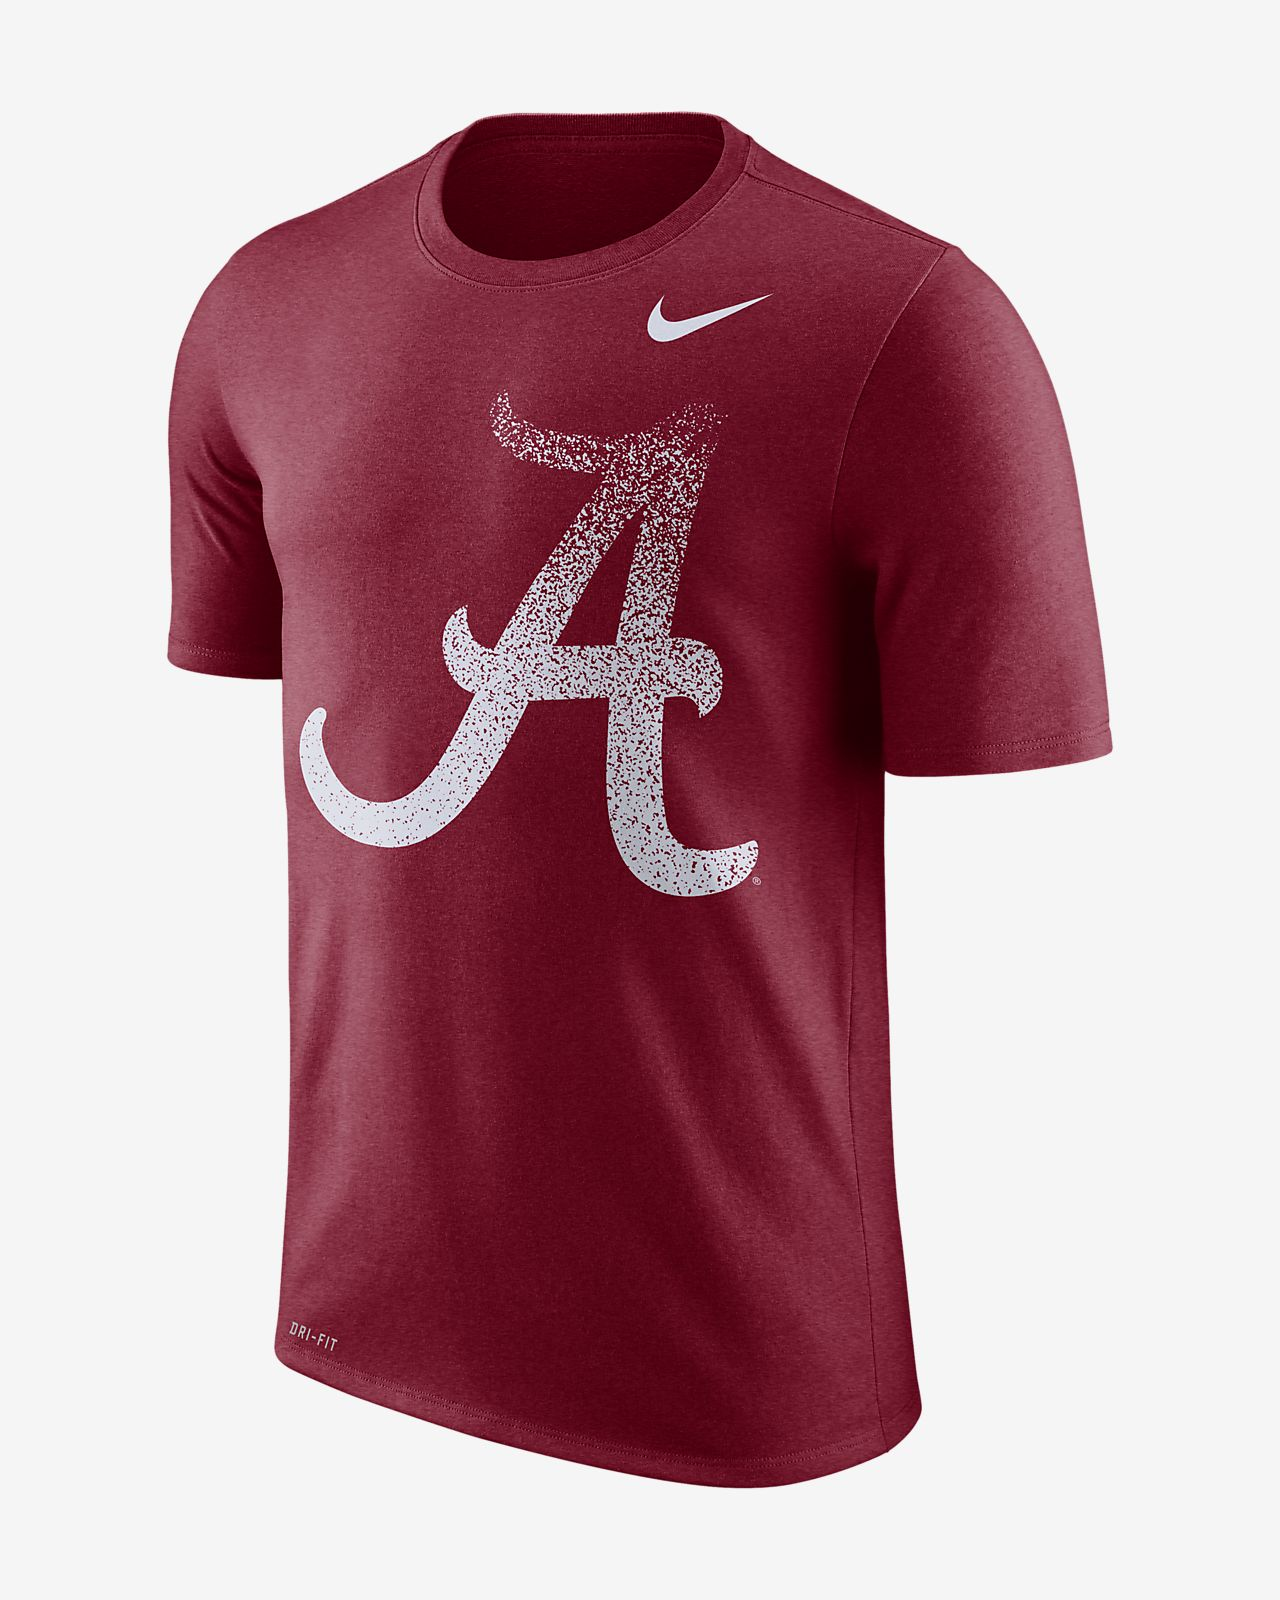 Nike Dri-FIT Legend (Alabama) Men's Short-Sleeve T-Shirt